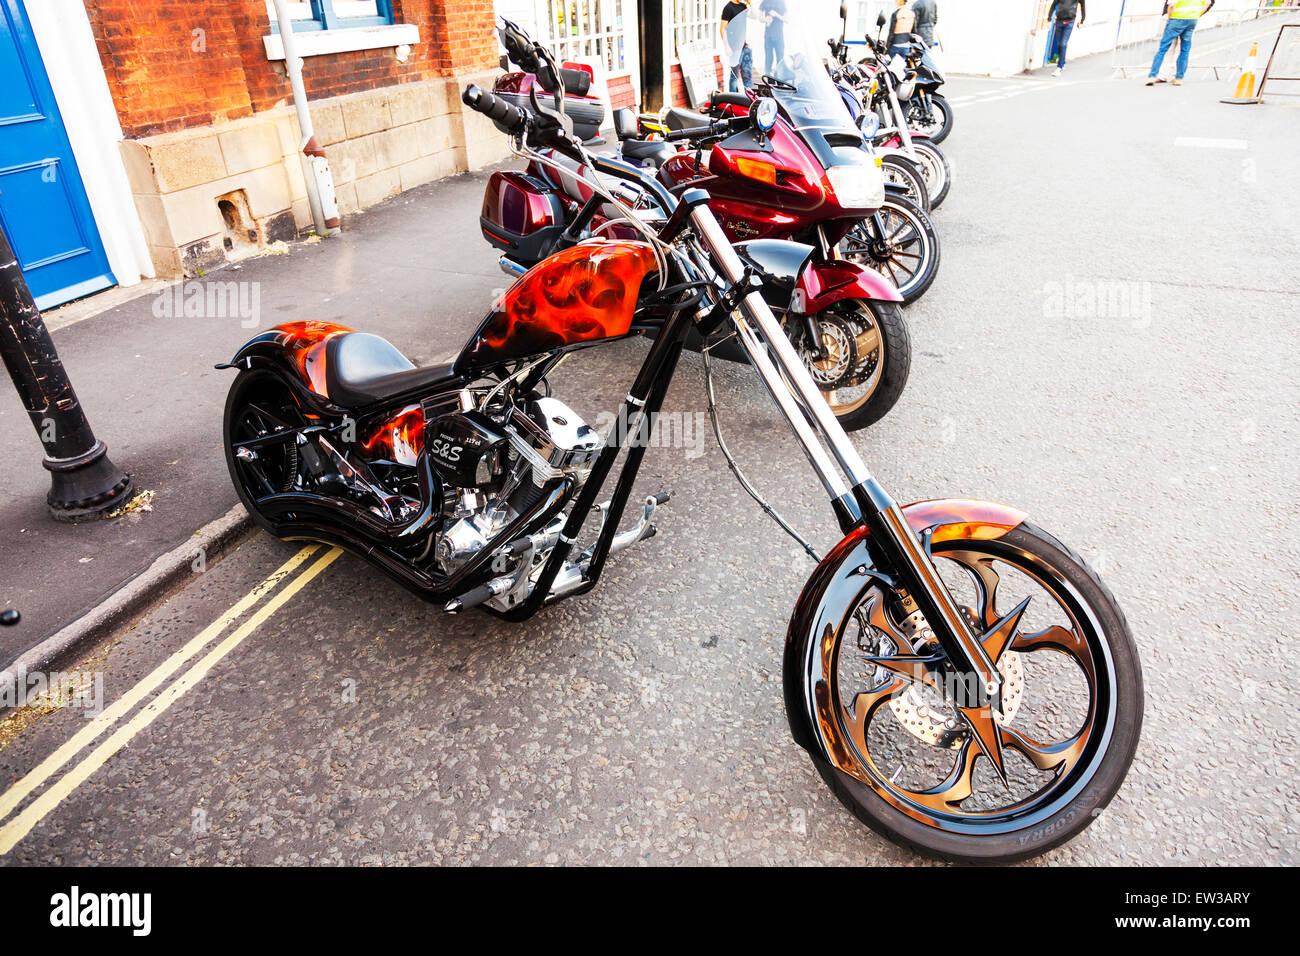 Chopper Bike Stock Photos & Chopper Bike Stock Images - Alamy